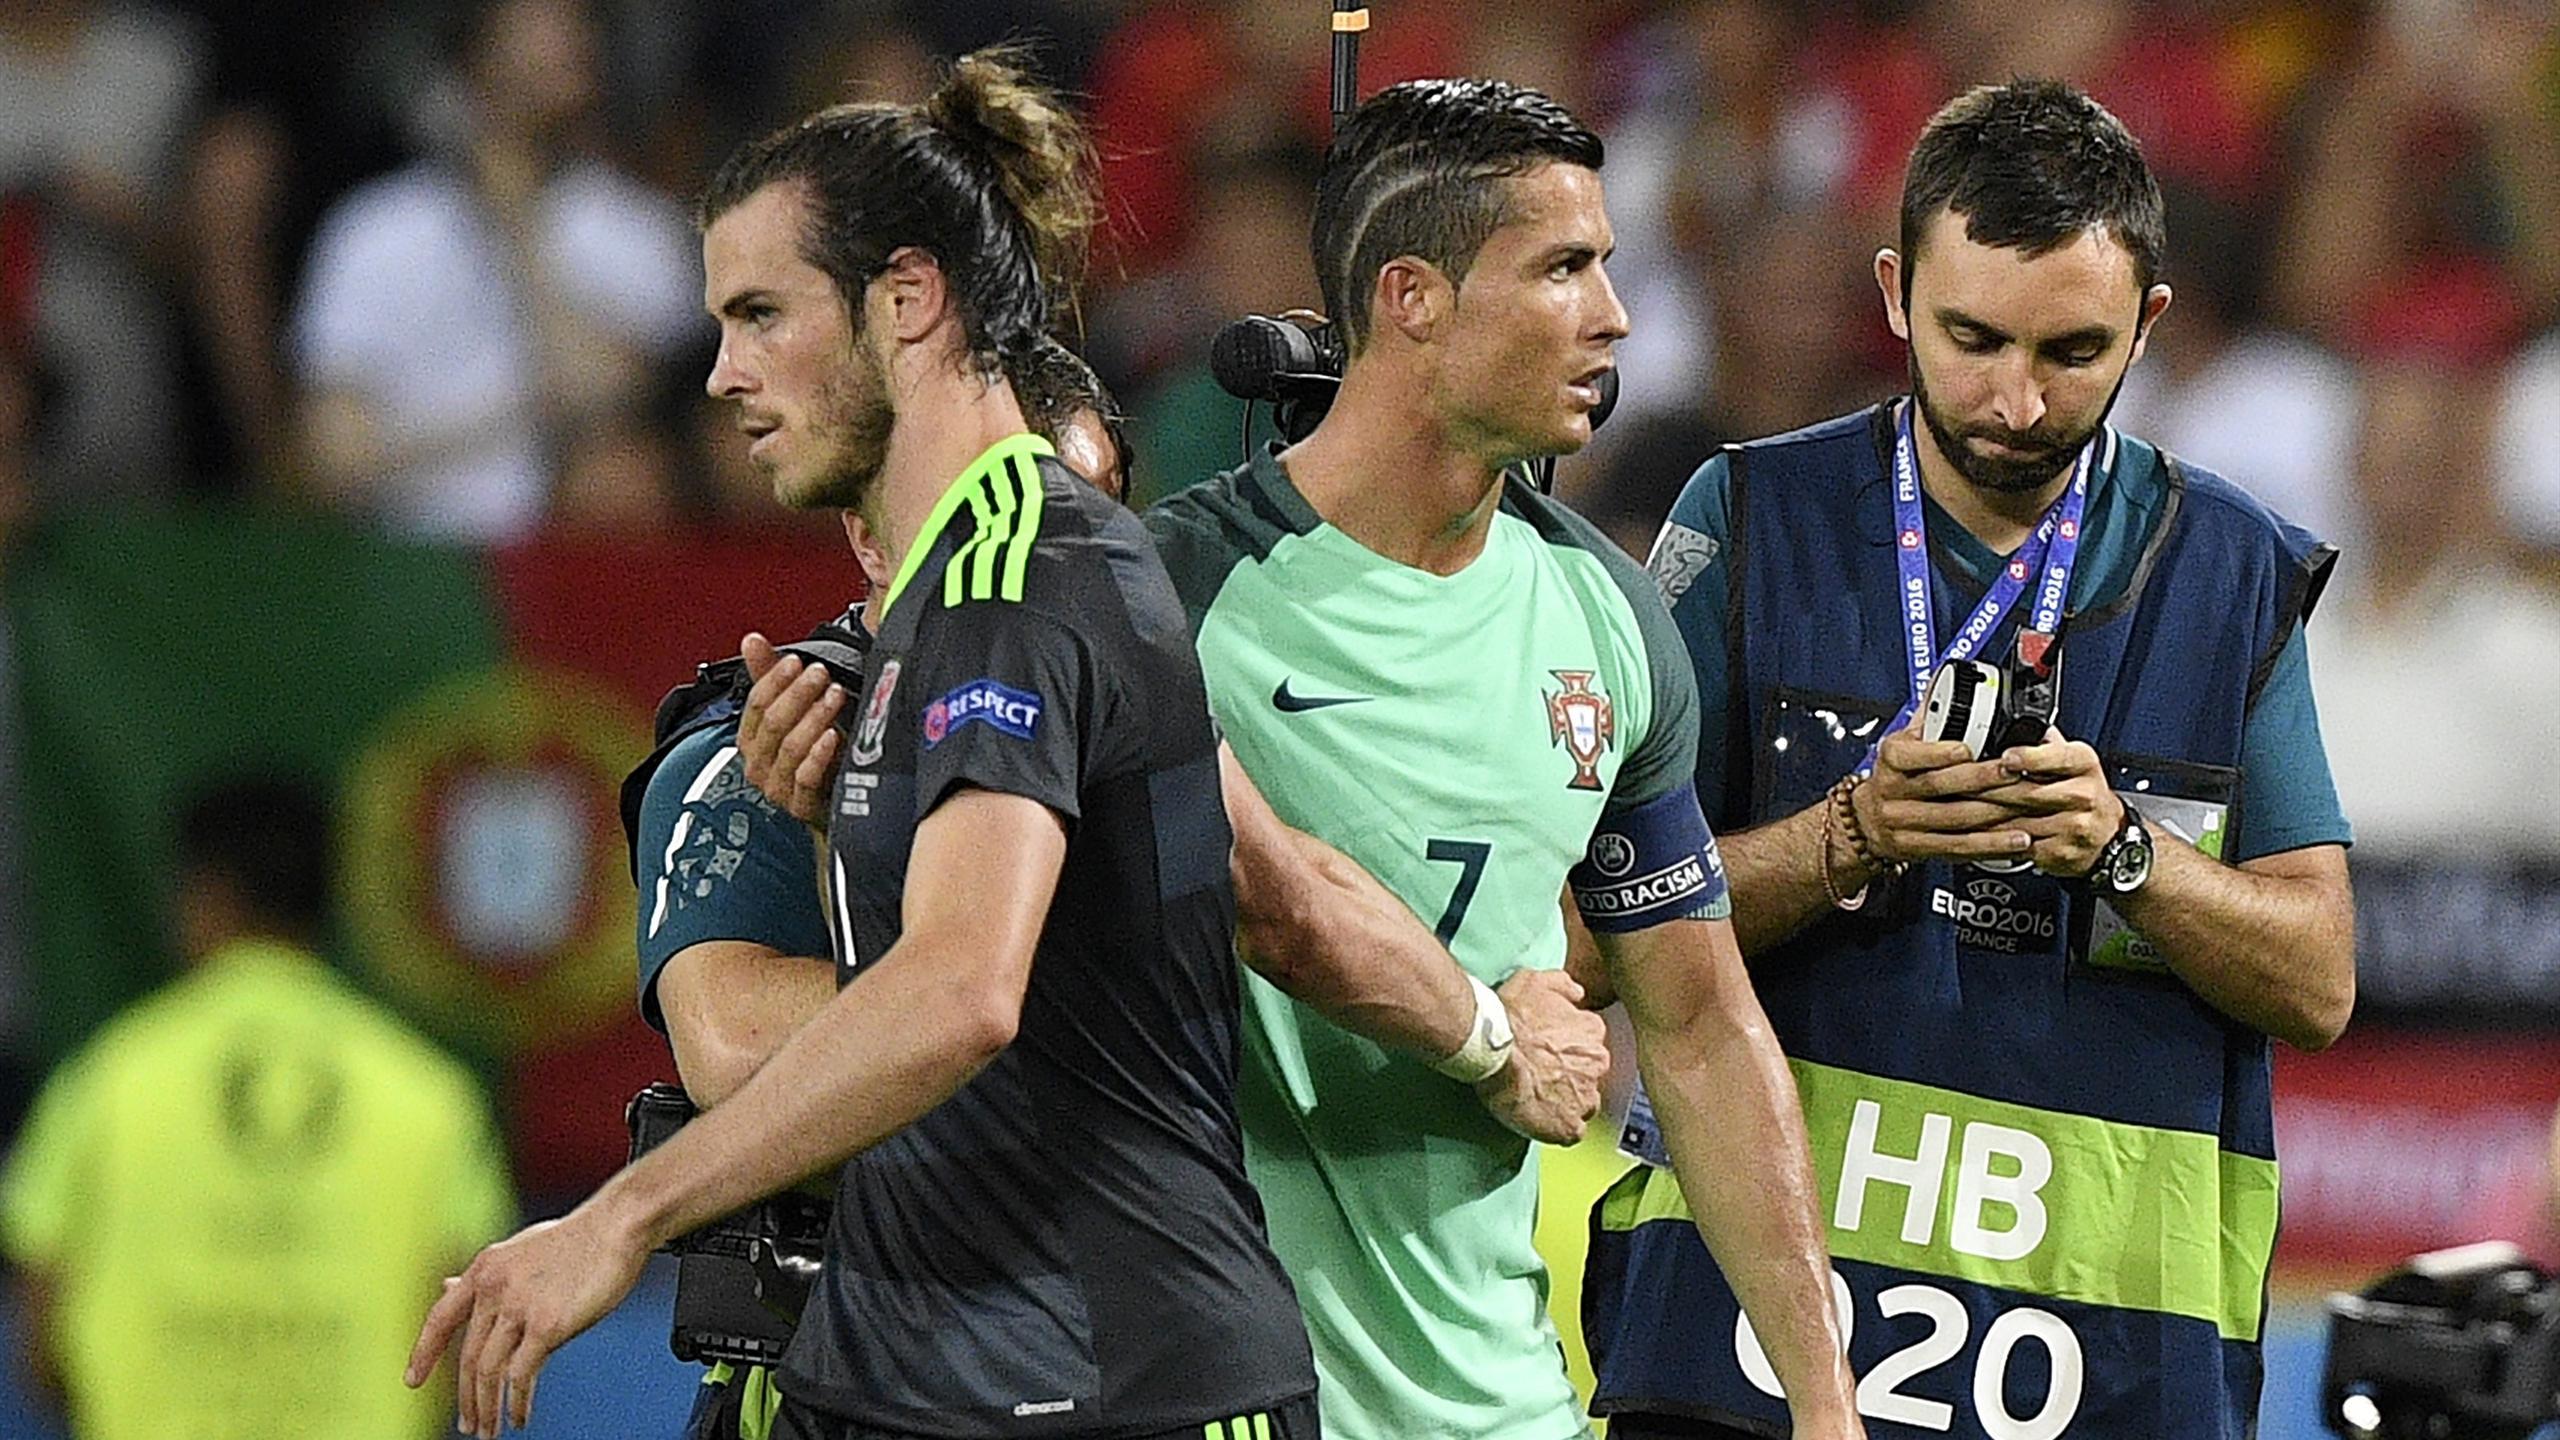 Wales' forward Gareth Bale (L) and Portugal's forward Cristiano Ronaldo